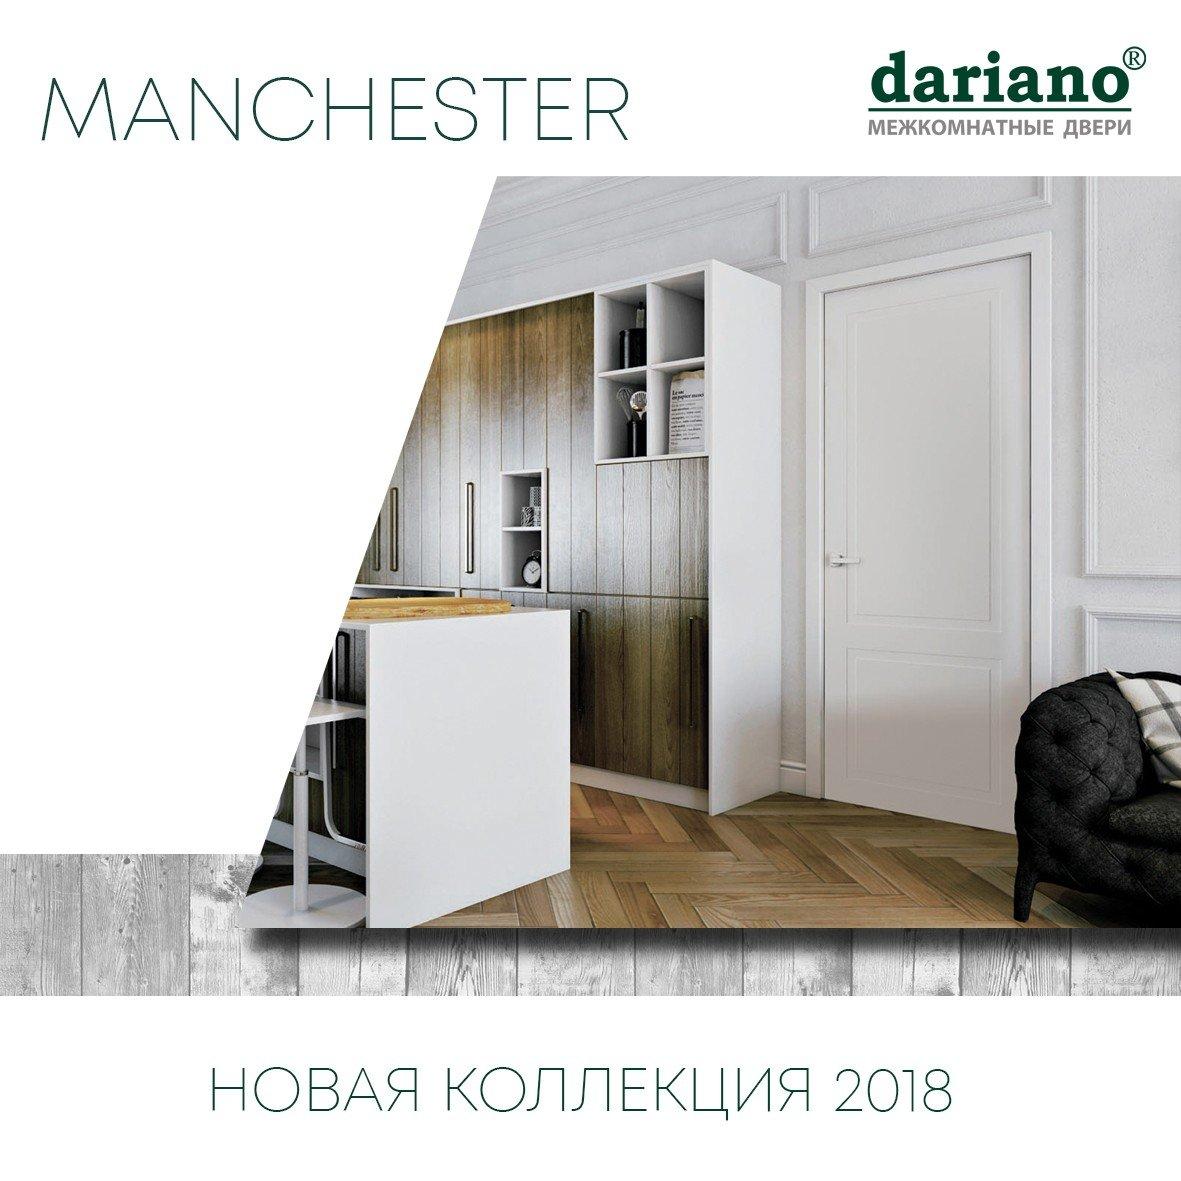 Dariano - модель июня манчестер (3)